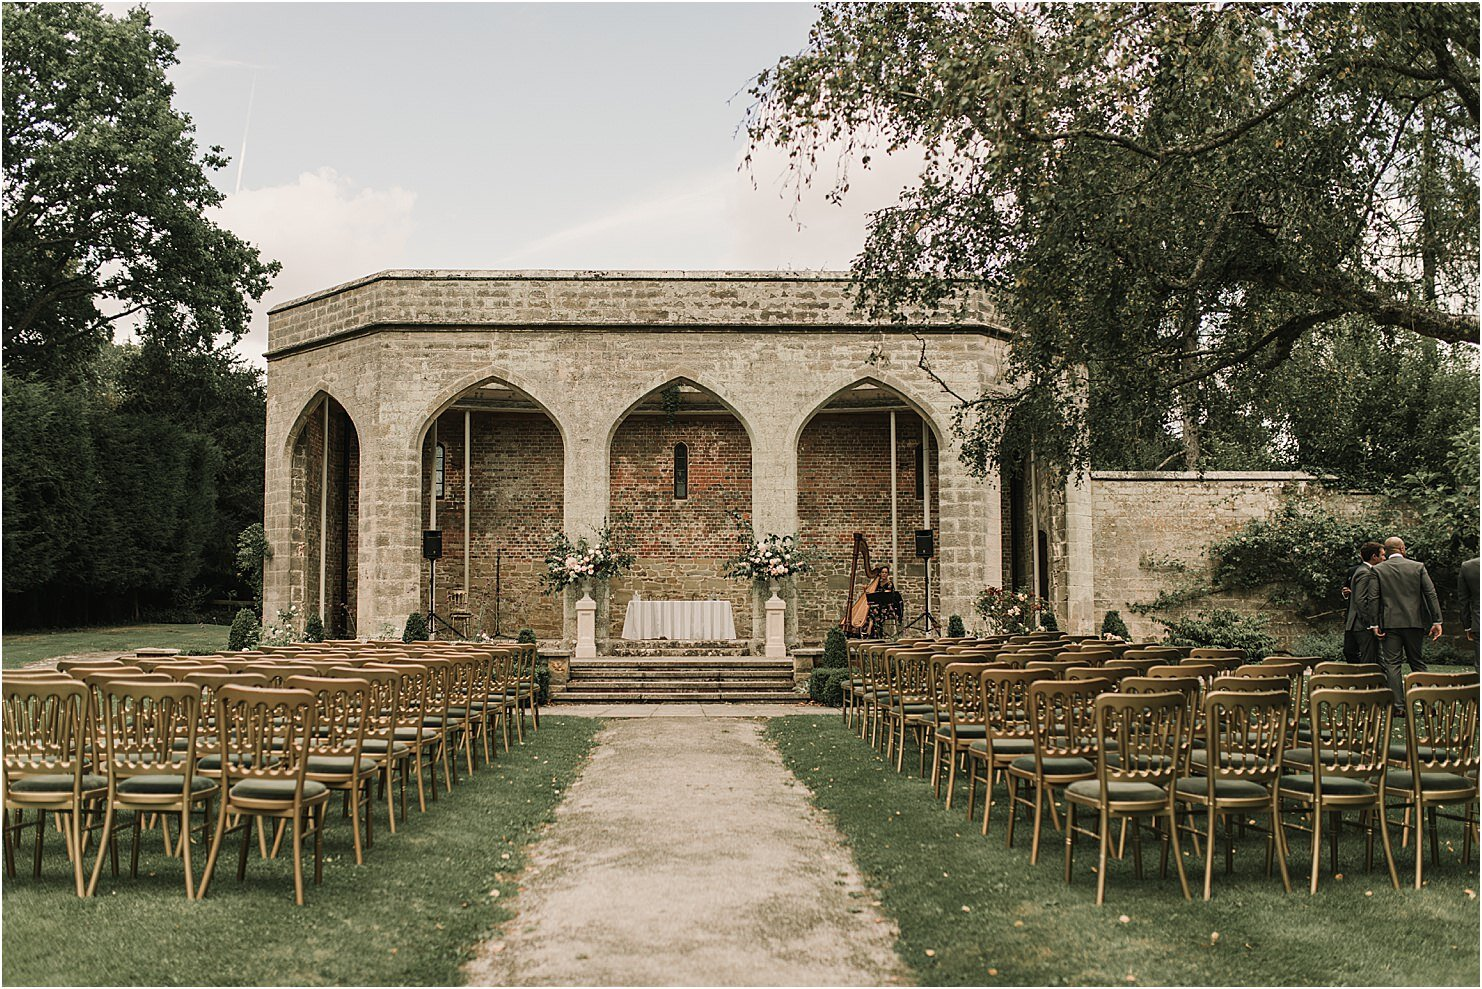 boda-de-cuento-en-castillo-boda-en-londres-38.jpg